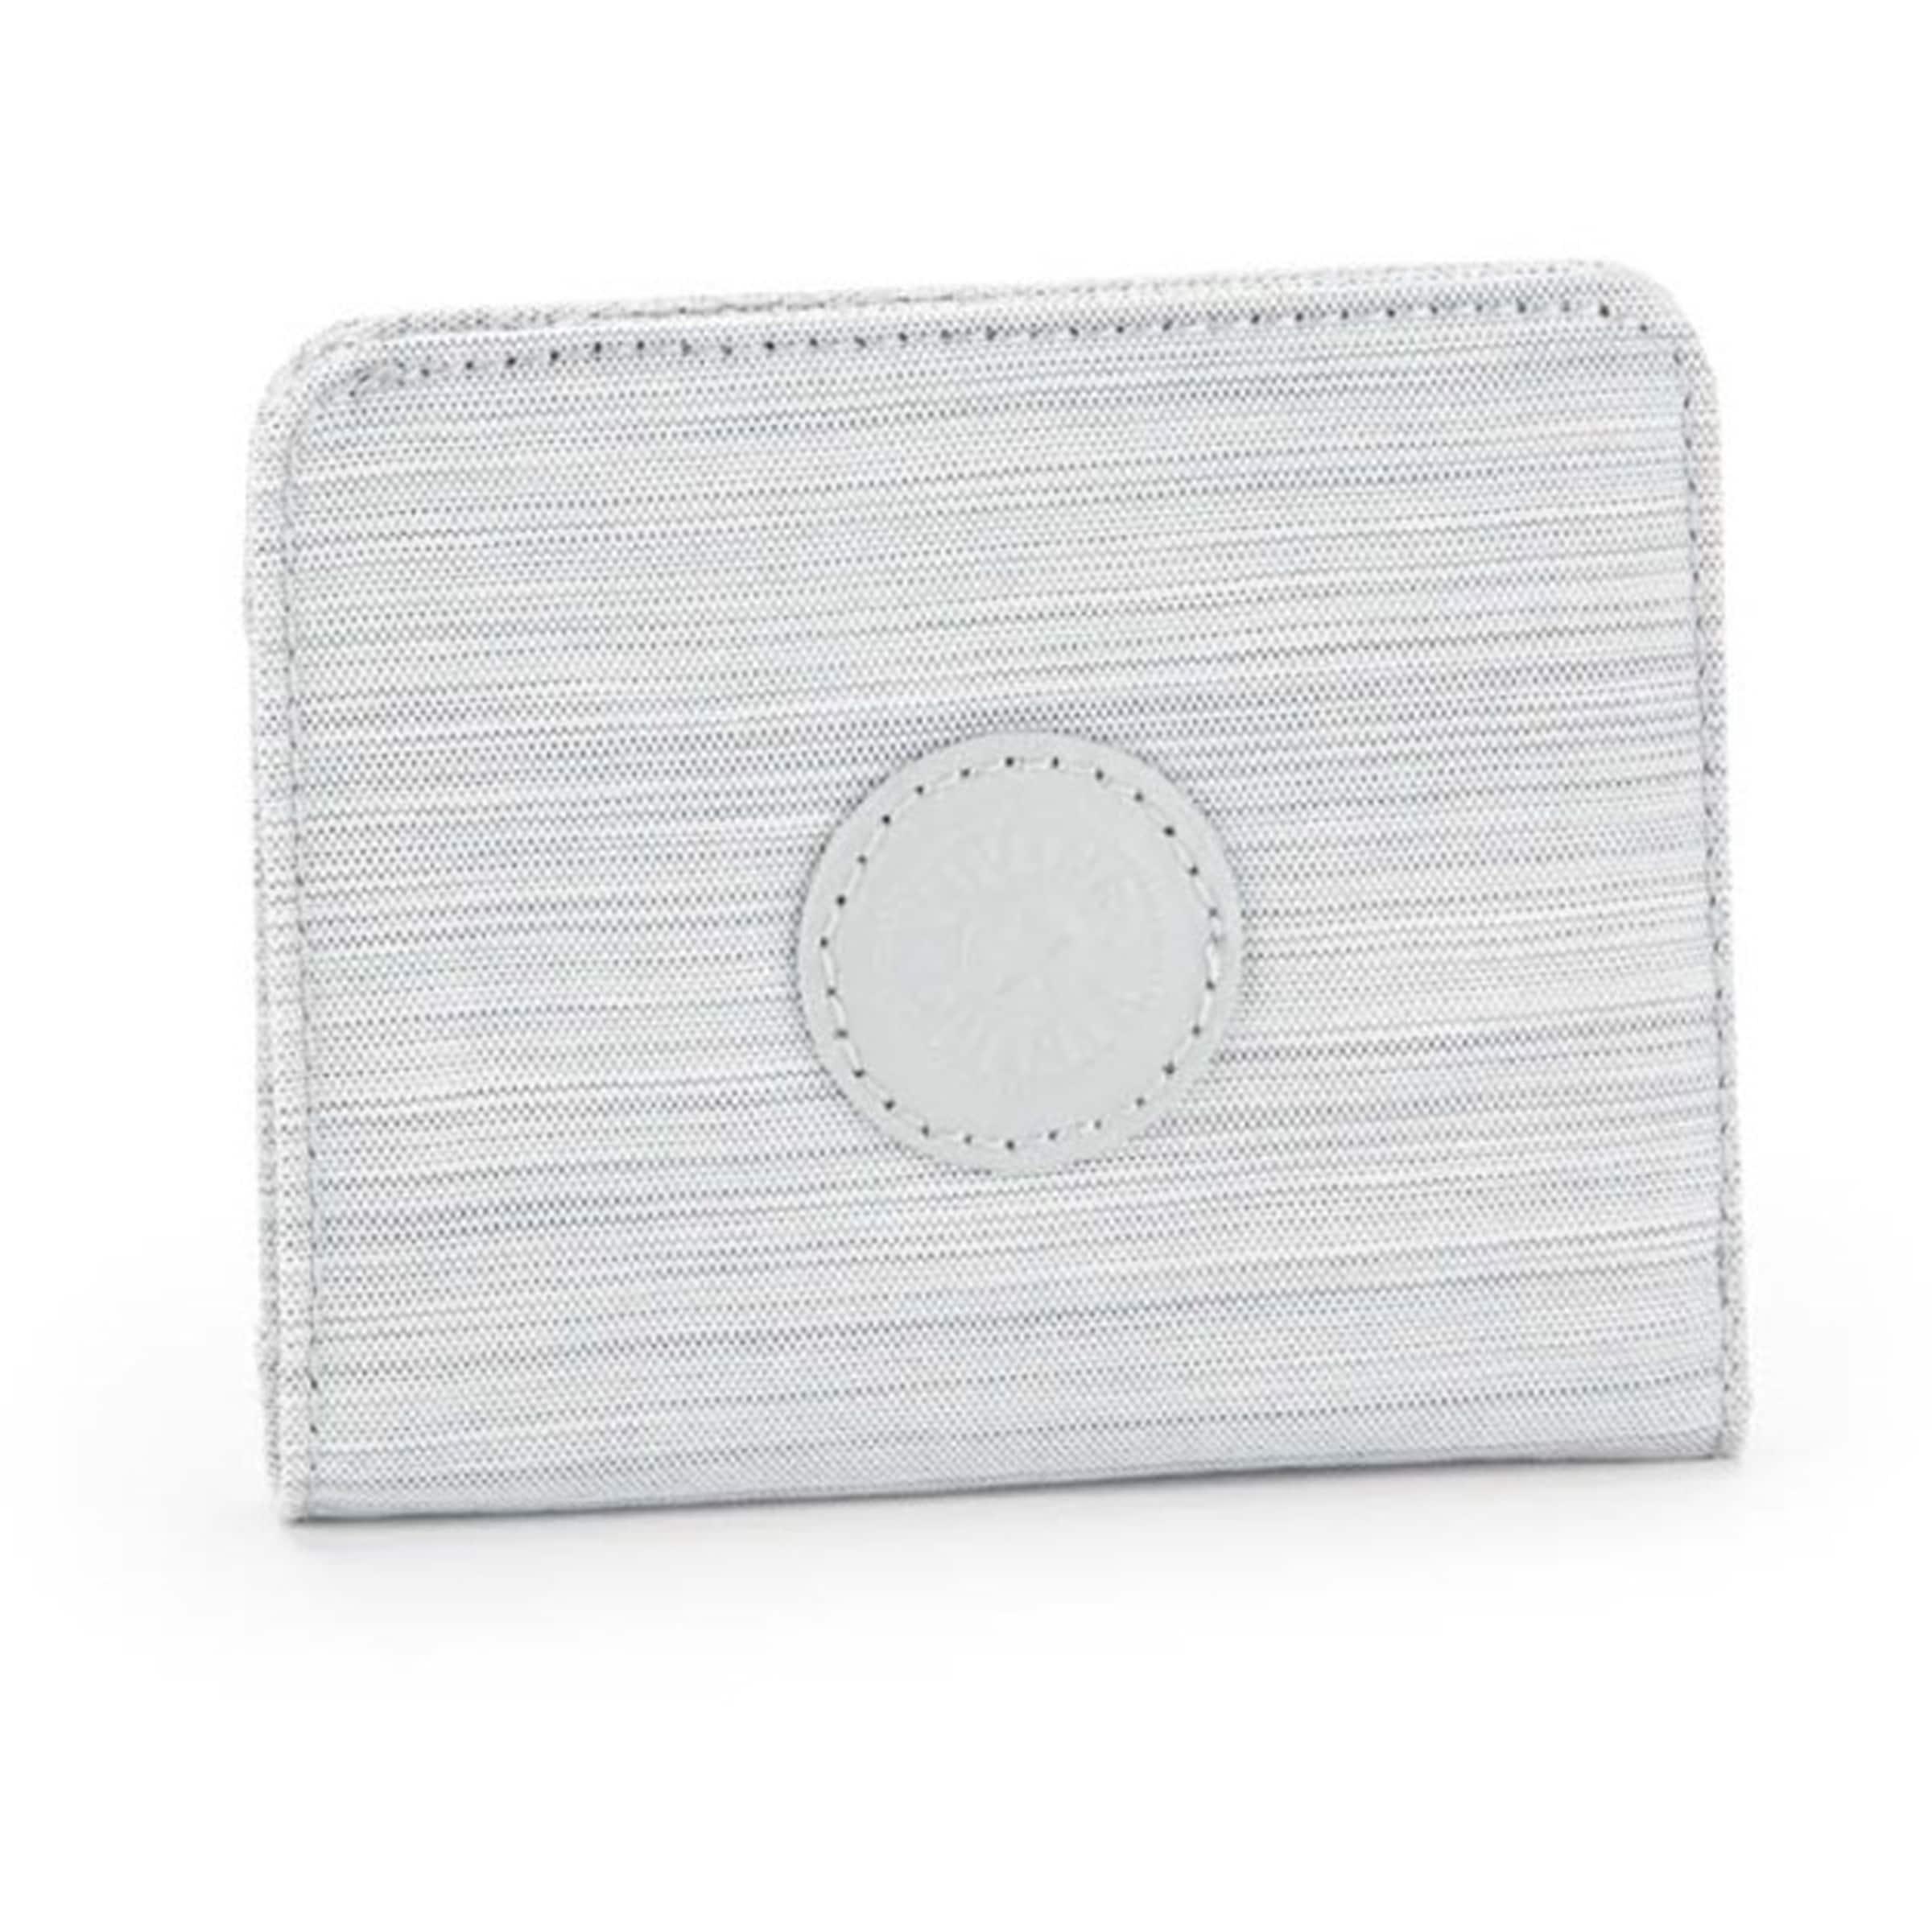 KIPLING Florencia Medium Geldbörse 10 cm Viele Arten TeoZK7K